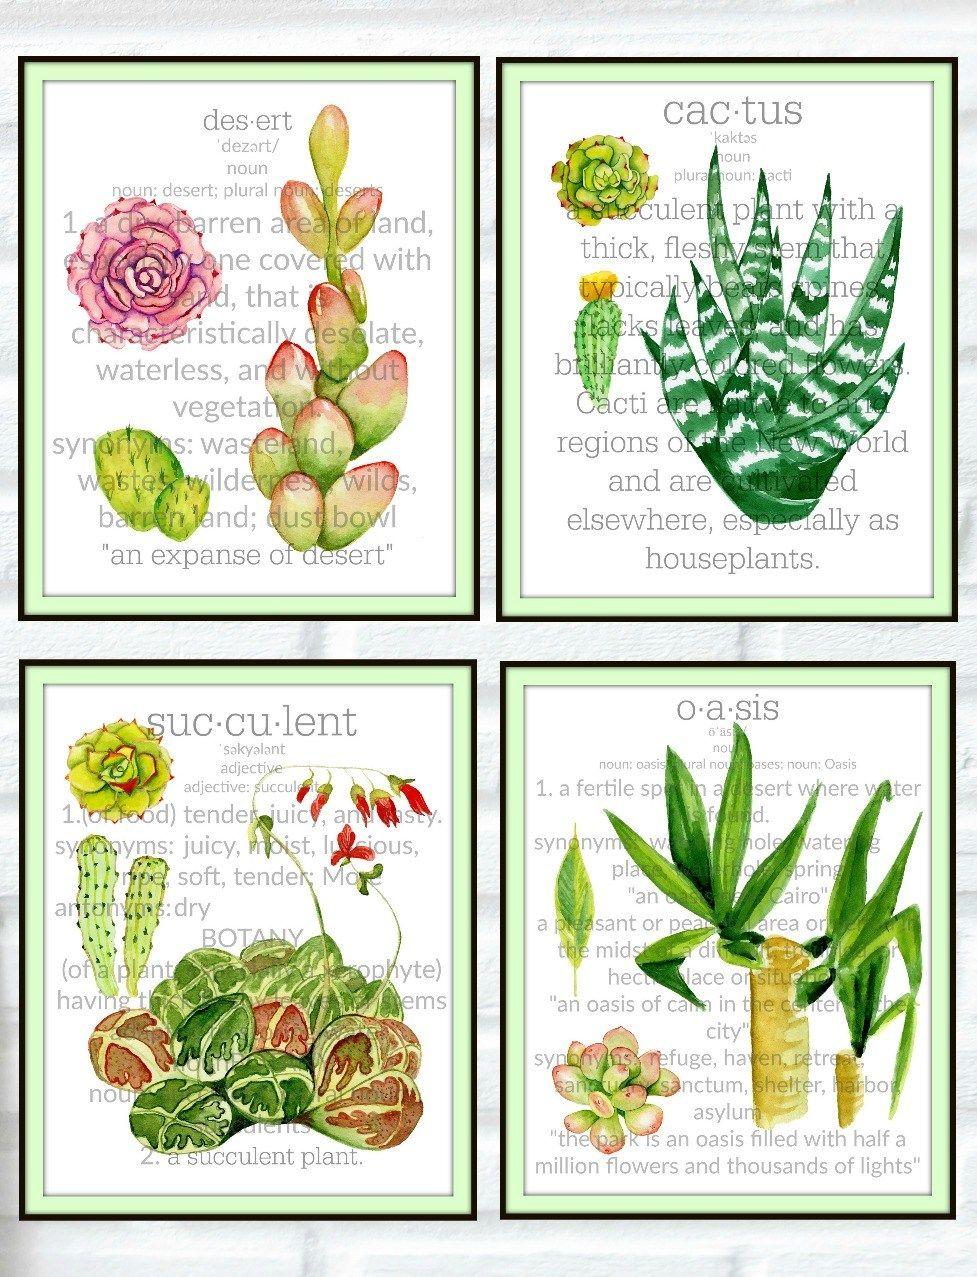 Sensational Cactus Succulent Botanical Prints Crafting Is My Therapy Botanical Prints Succulents Prints Free Art Prints